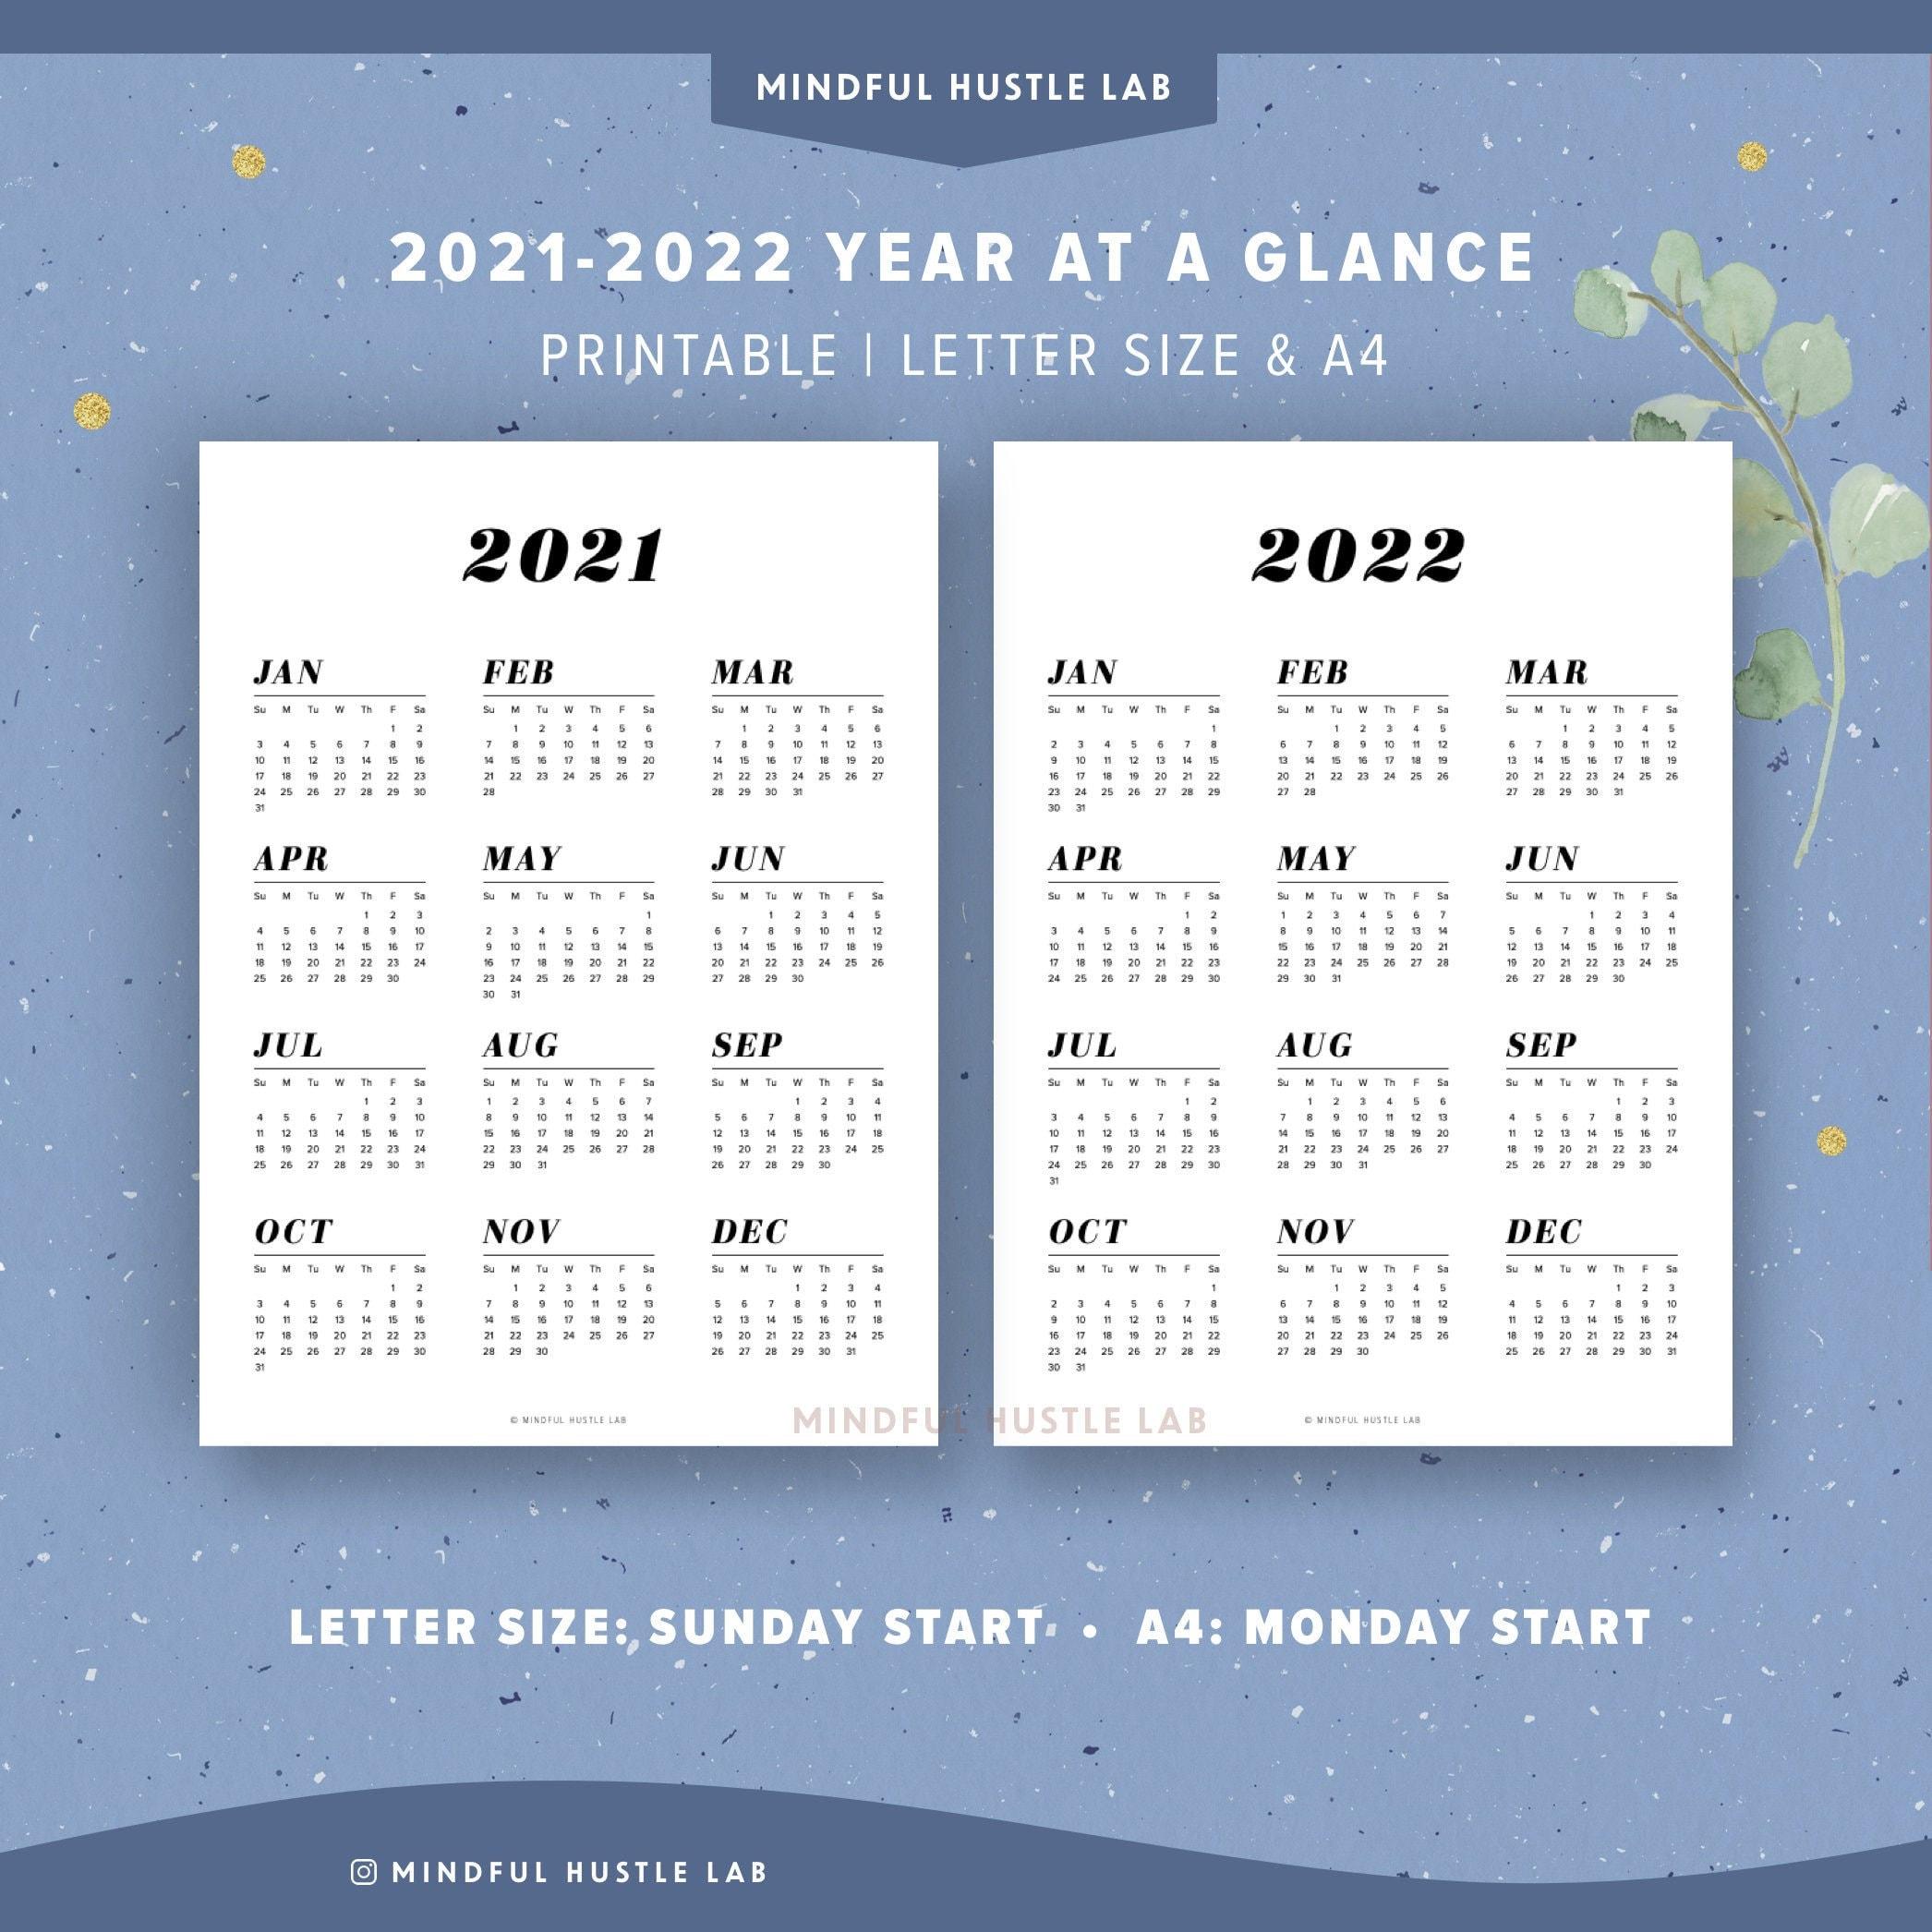 2022 Calendar At A Glance.2021 2022 Year At A Glance Calendar Printable Yearly Agenda Etsy